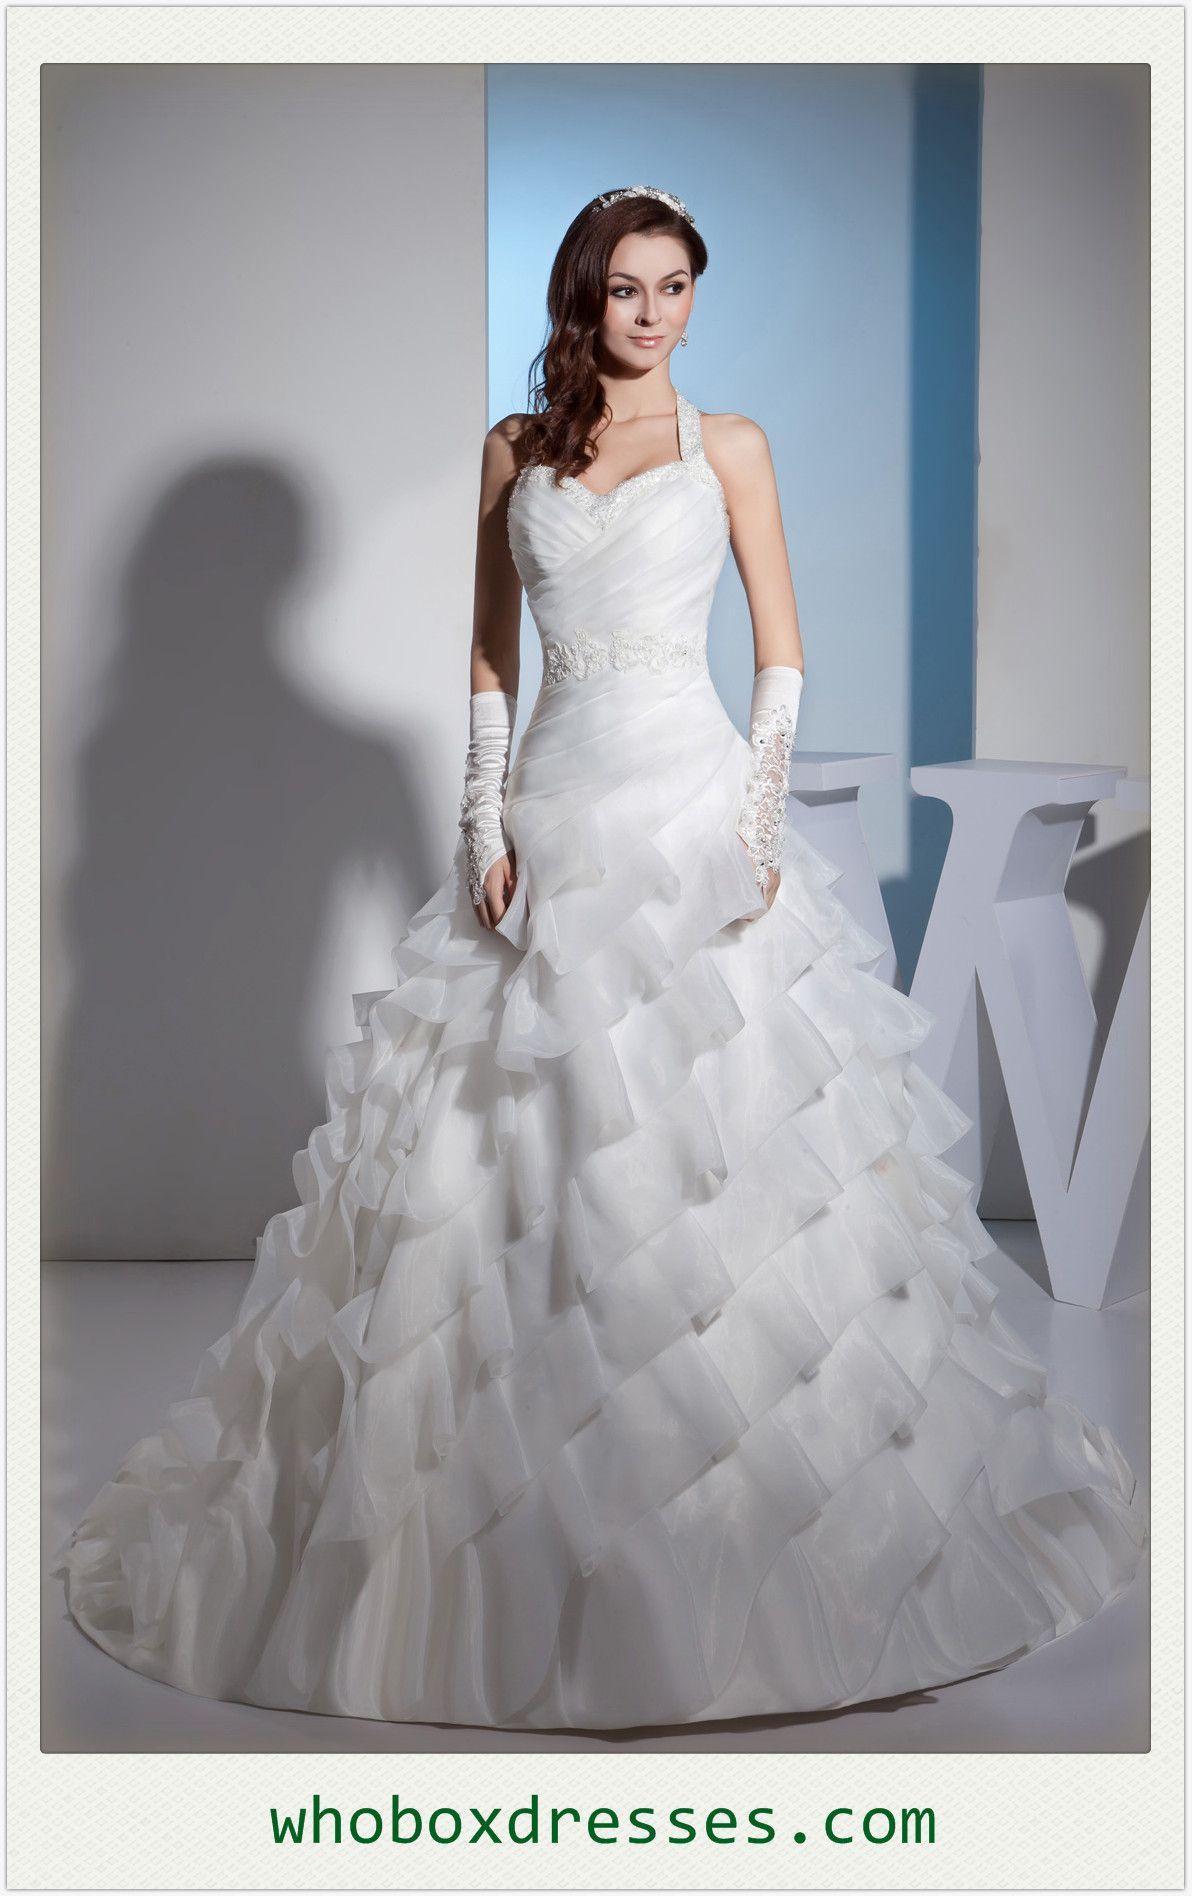 Bridal Dresses And Prices | Disney wedding dresses, Disney weddings ...